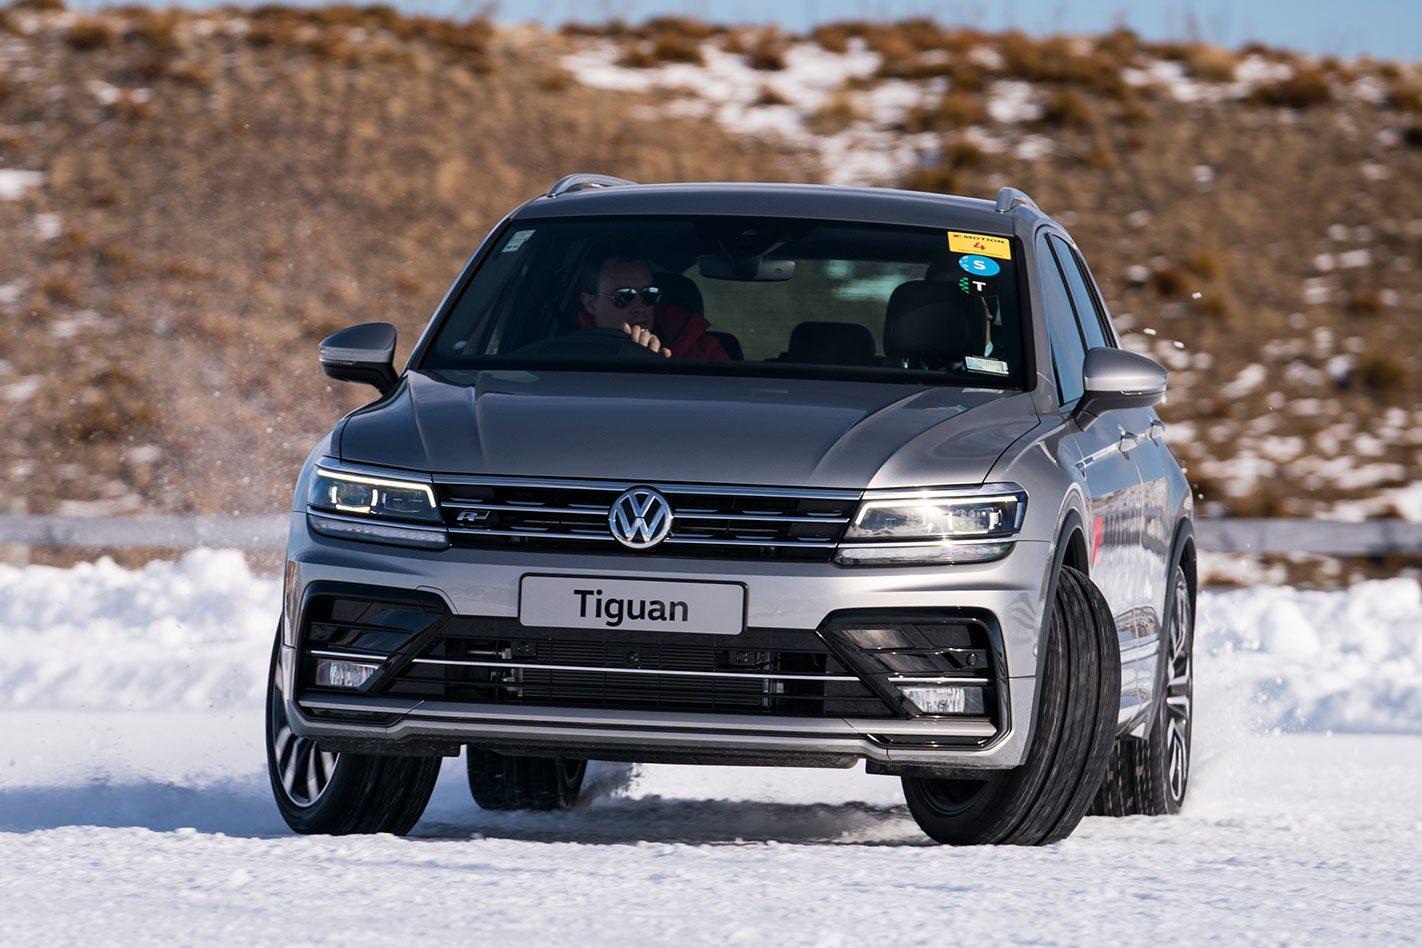 Volkswagen 4Motion takes the piste